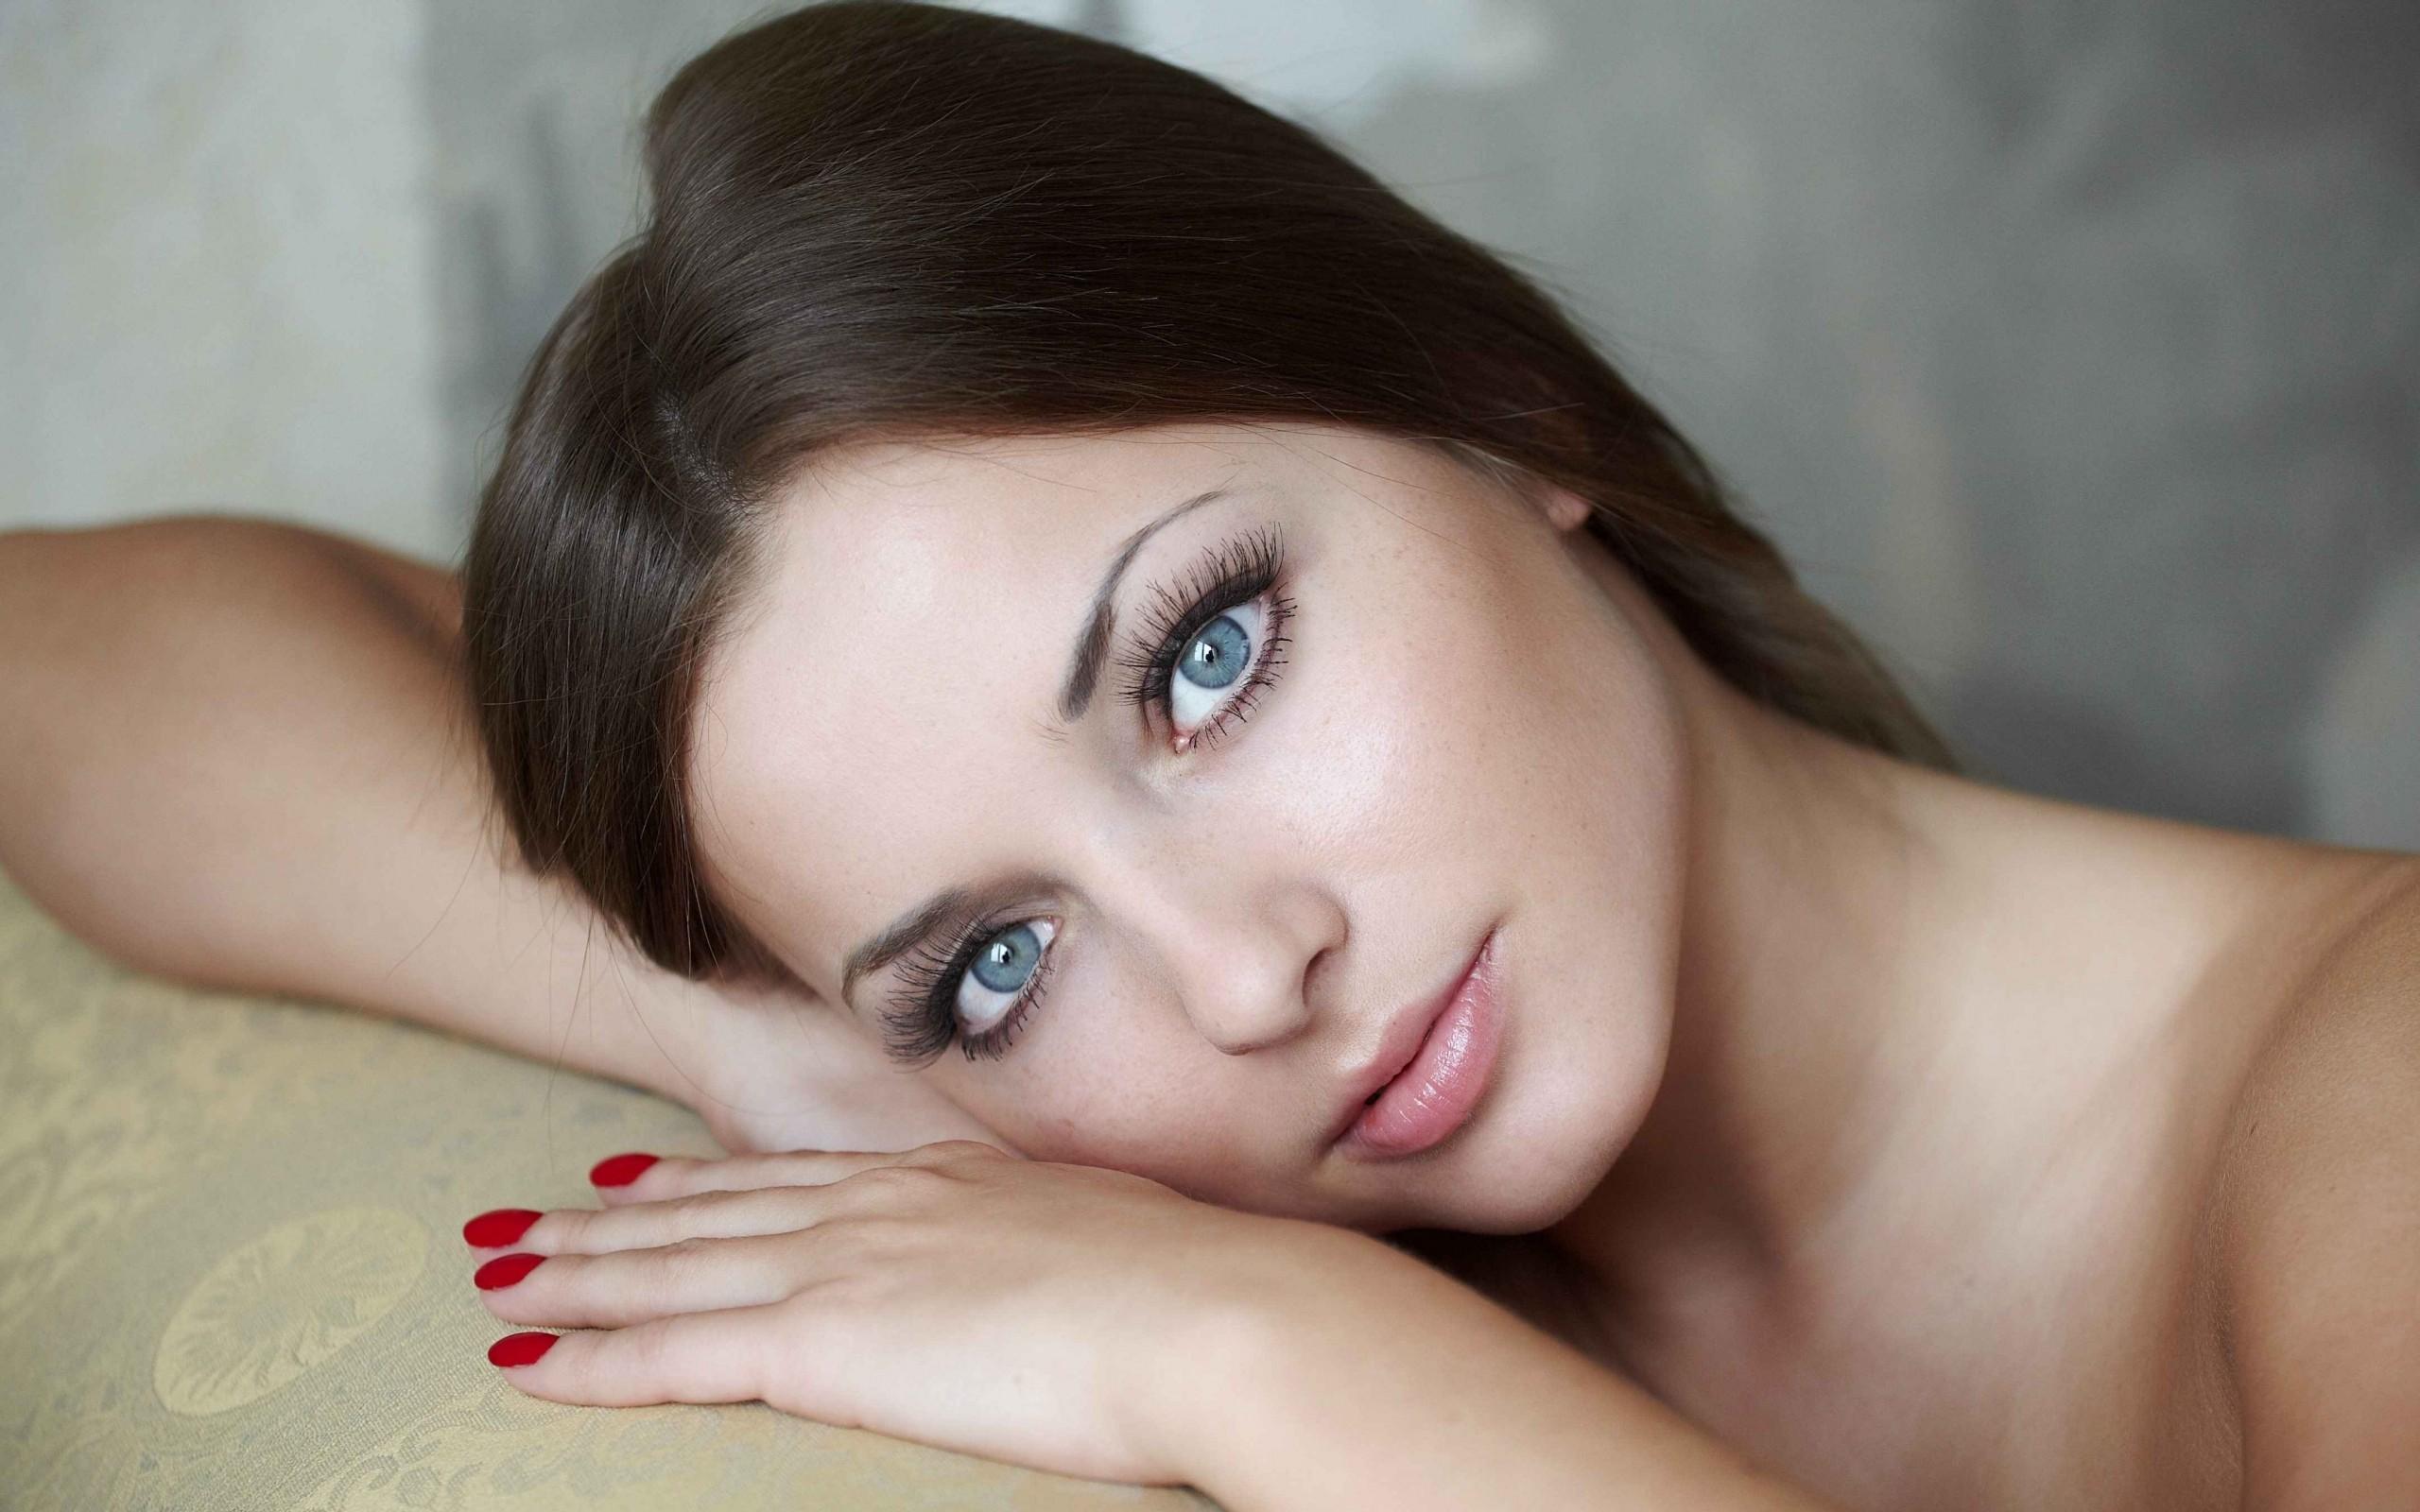 Chica hermosa con ojos azules - 2560x1600